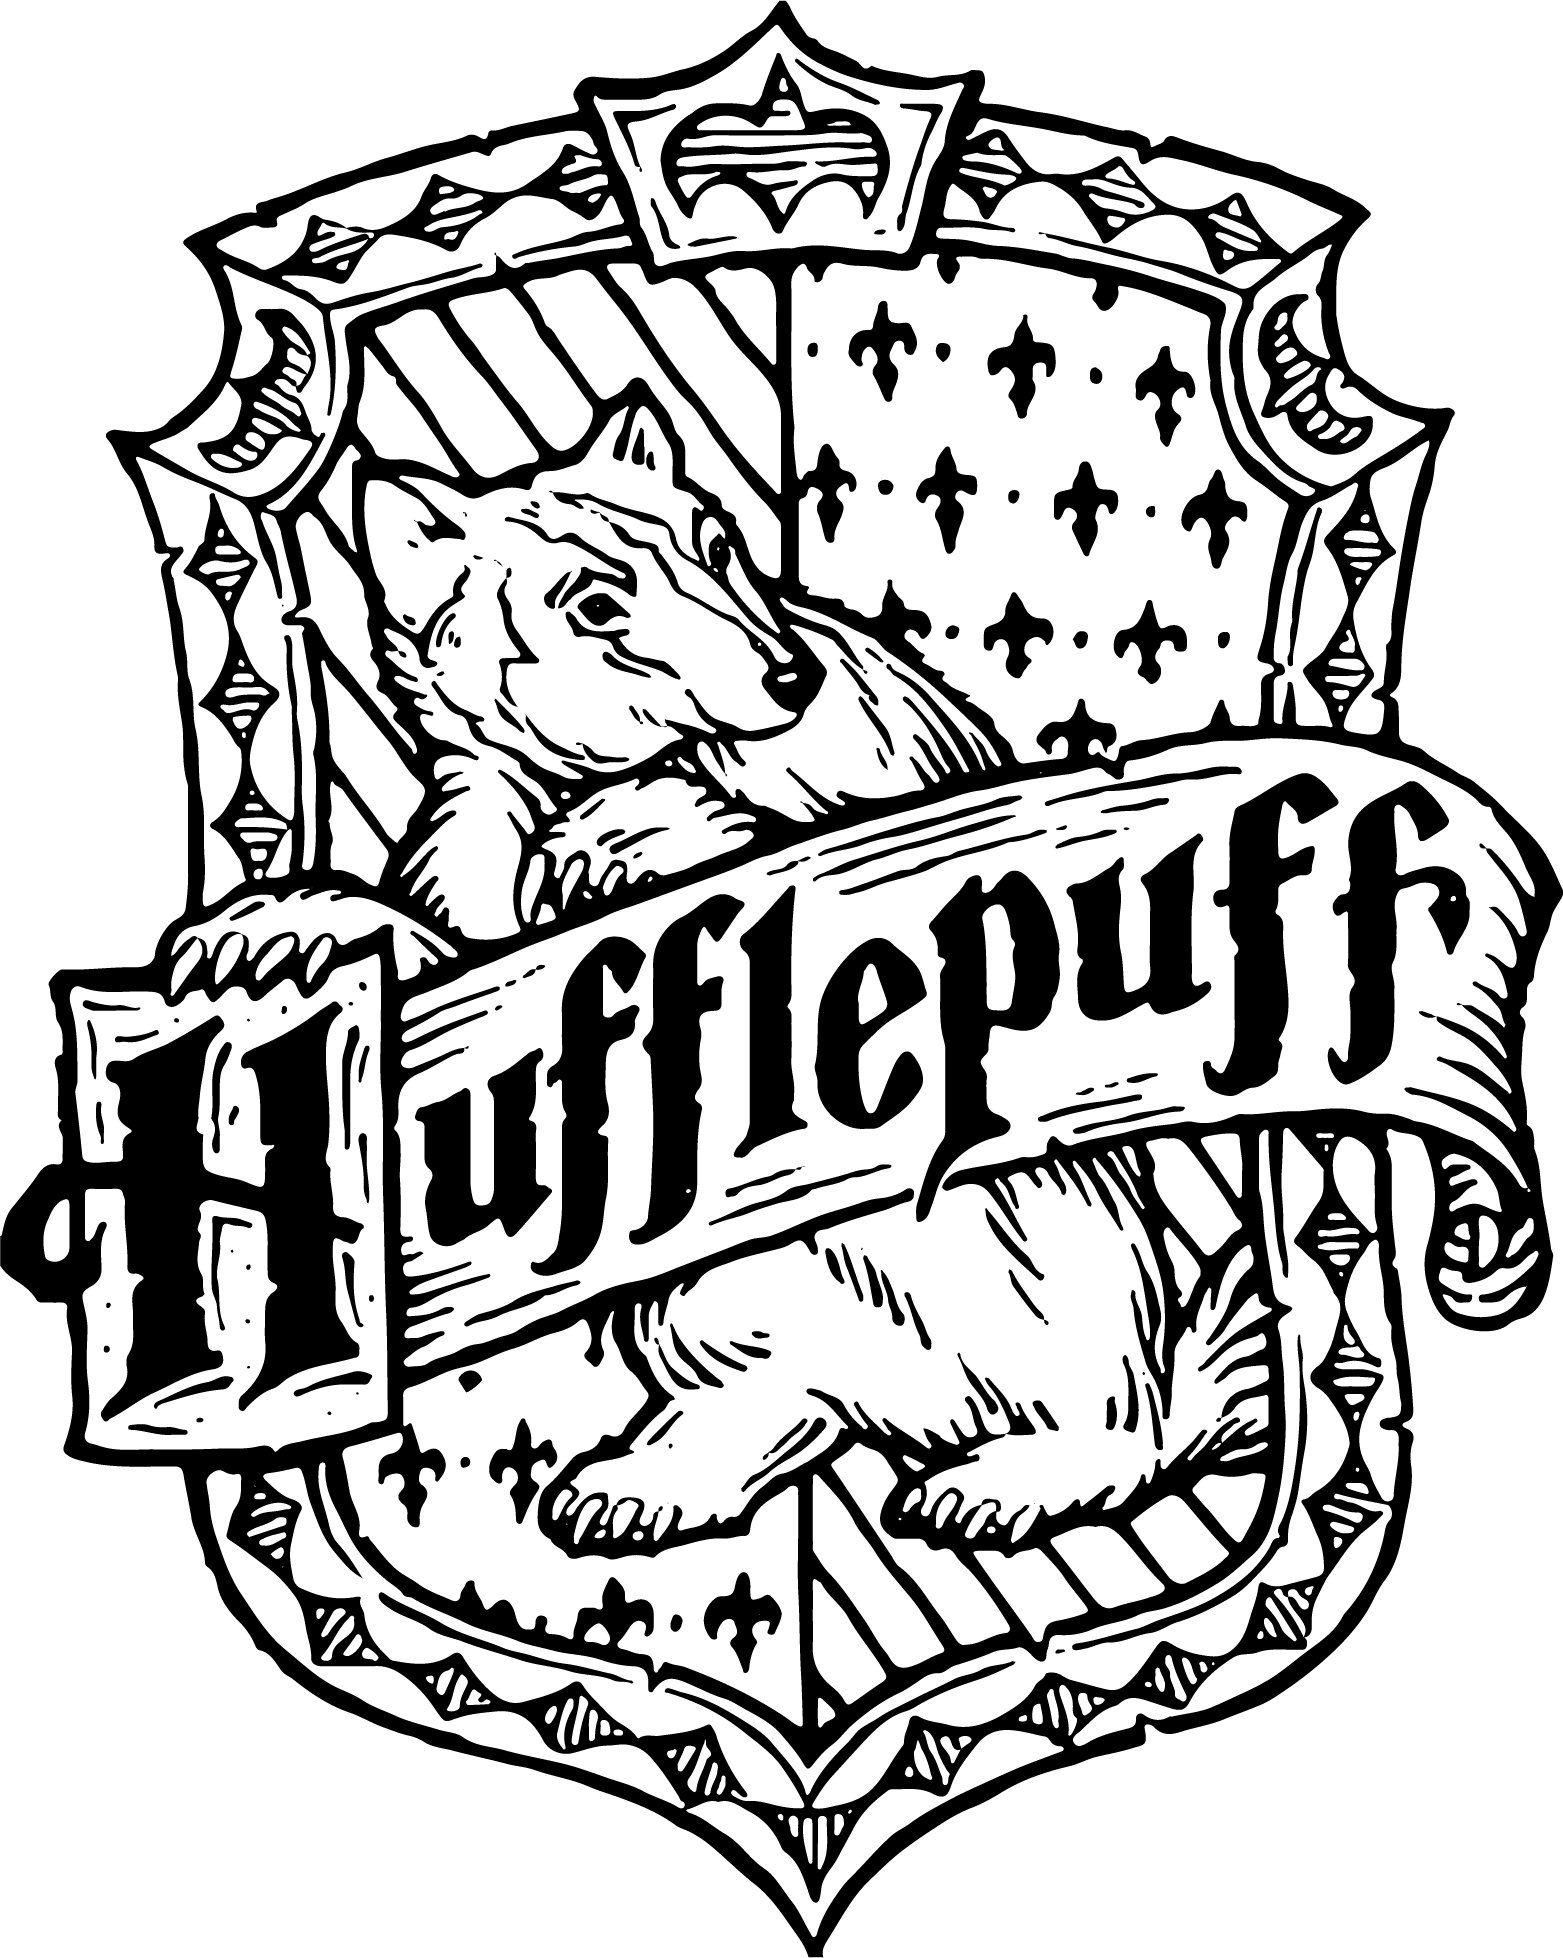 Hufflepuff Crest Emblem Badge Svg Harry Potter Hogwart S House Vector Illustration By Retro Harry Potter Colors Harry Potter Crest Harry Potter Hogwarts Houses